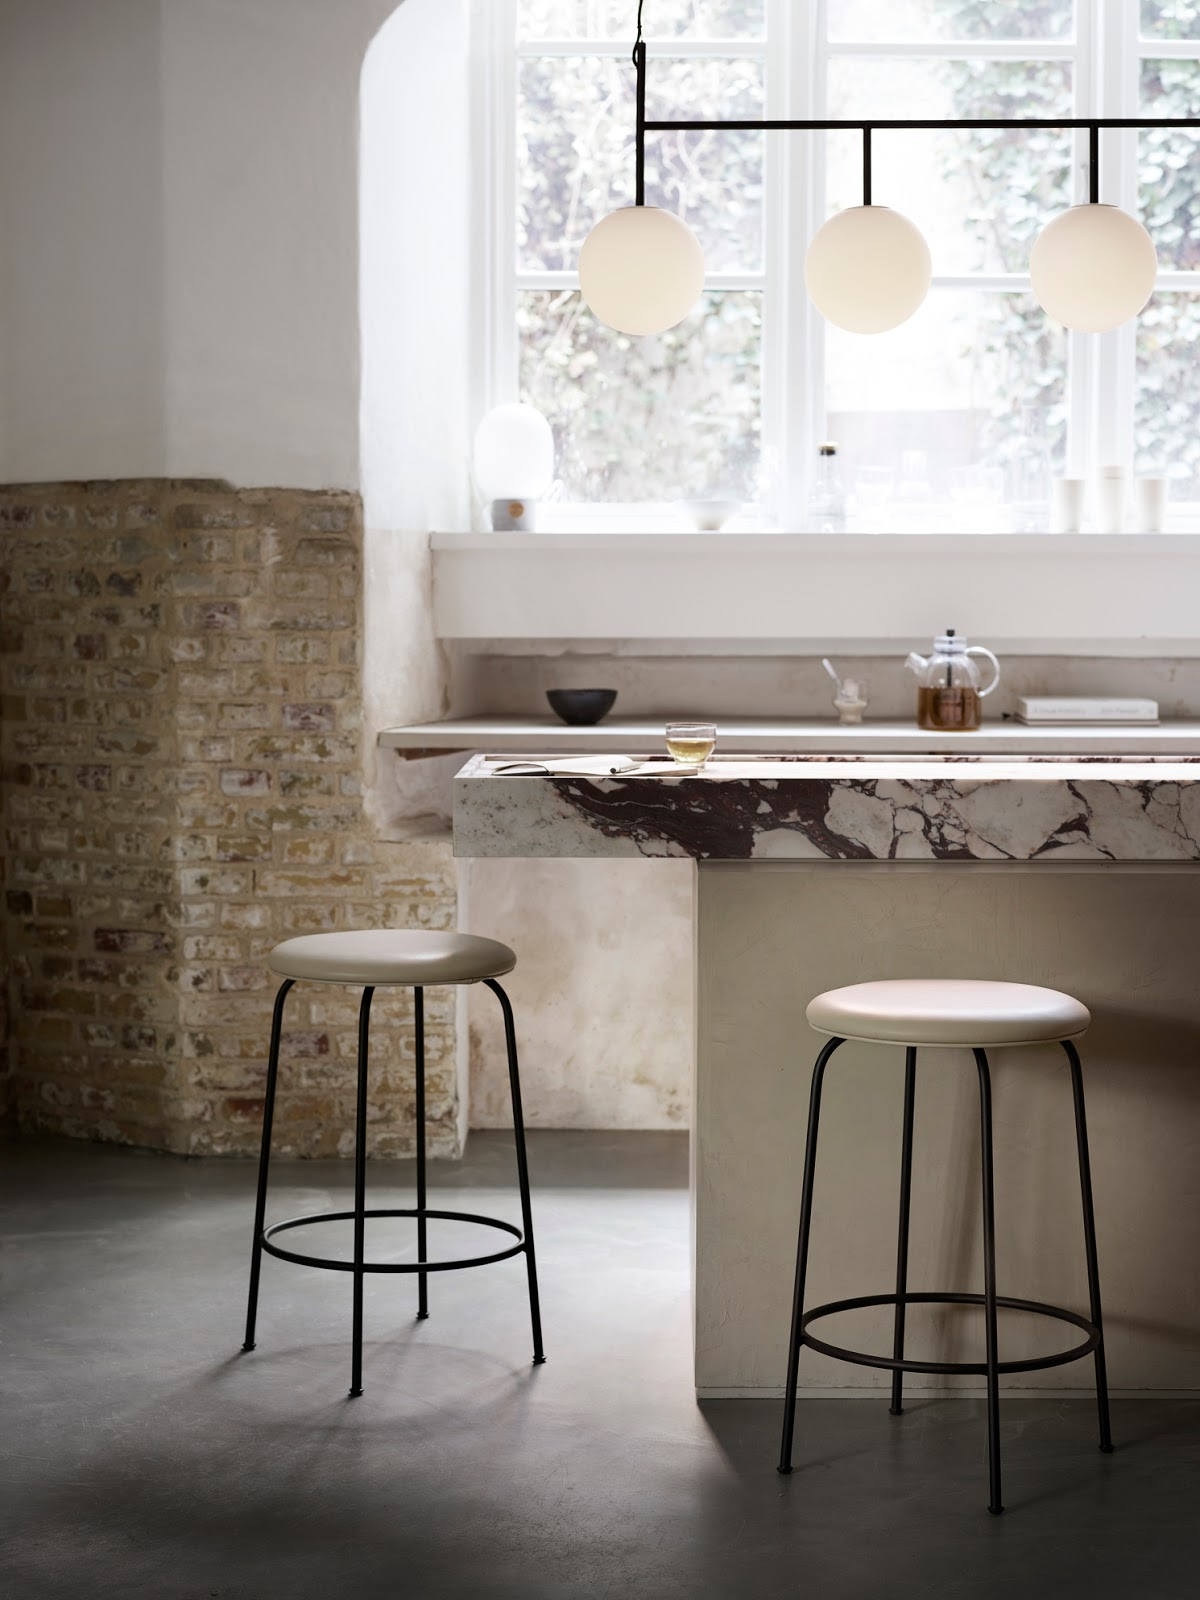 MENU Afteroom stool Counter Suspension